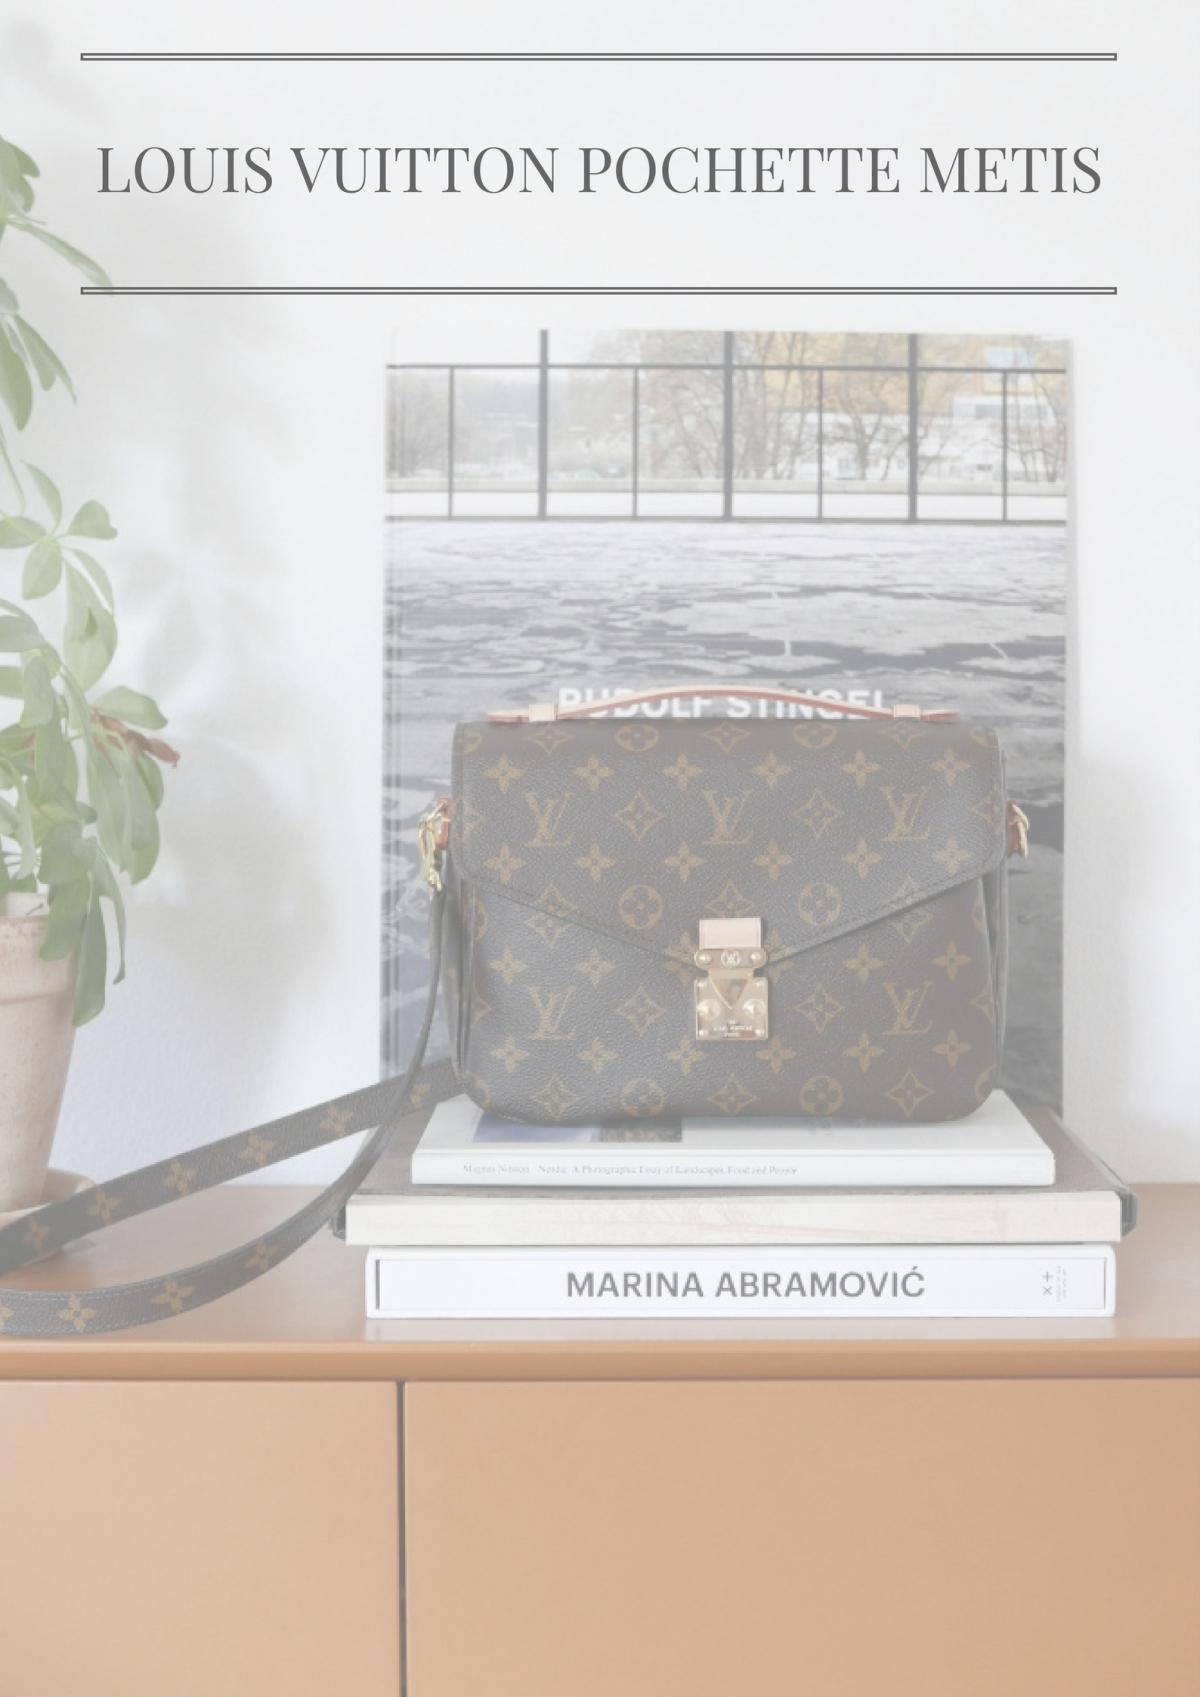 Louis Vuitton PochetteMetis